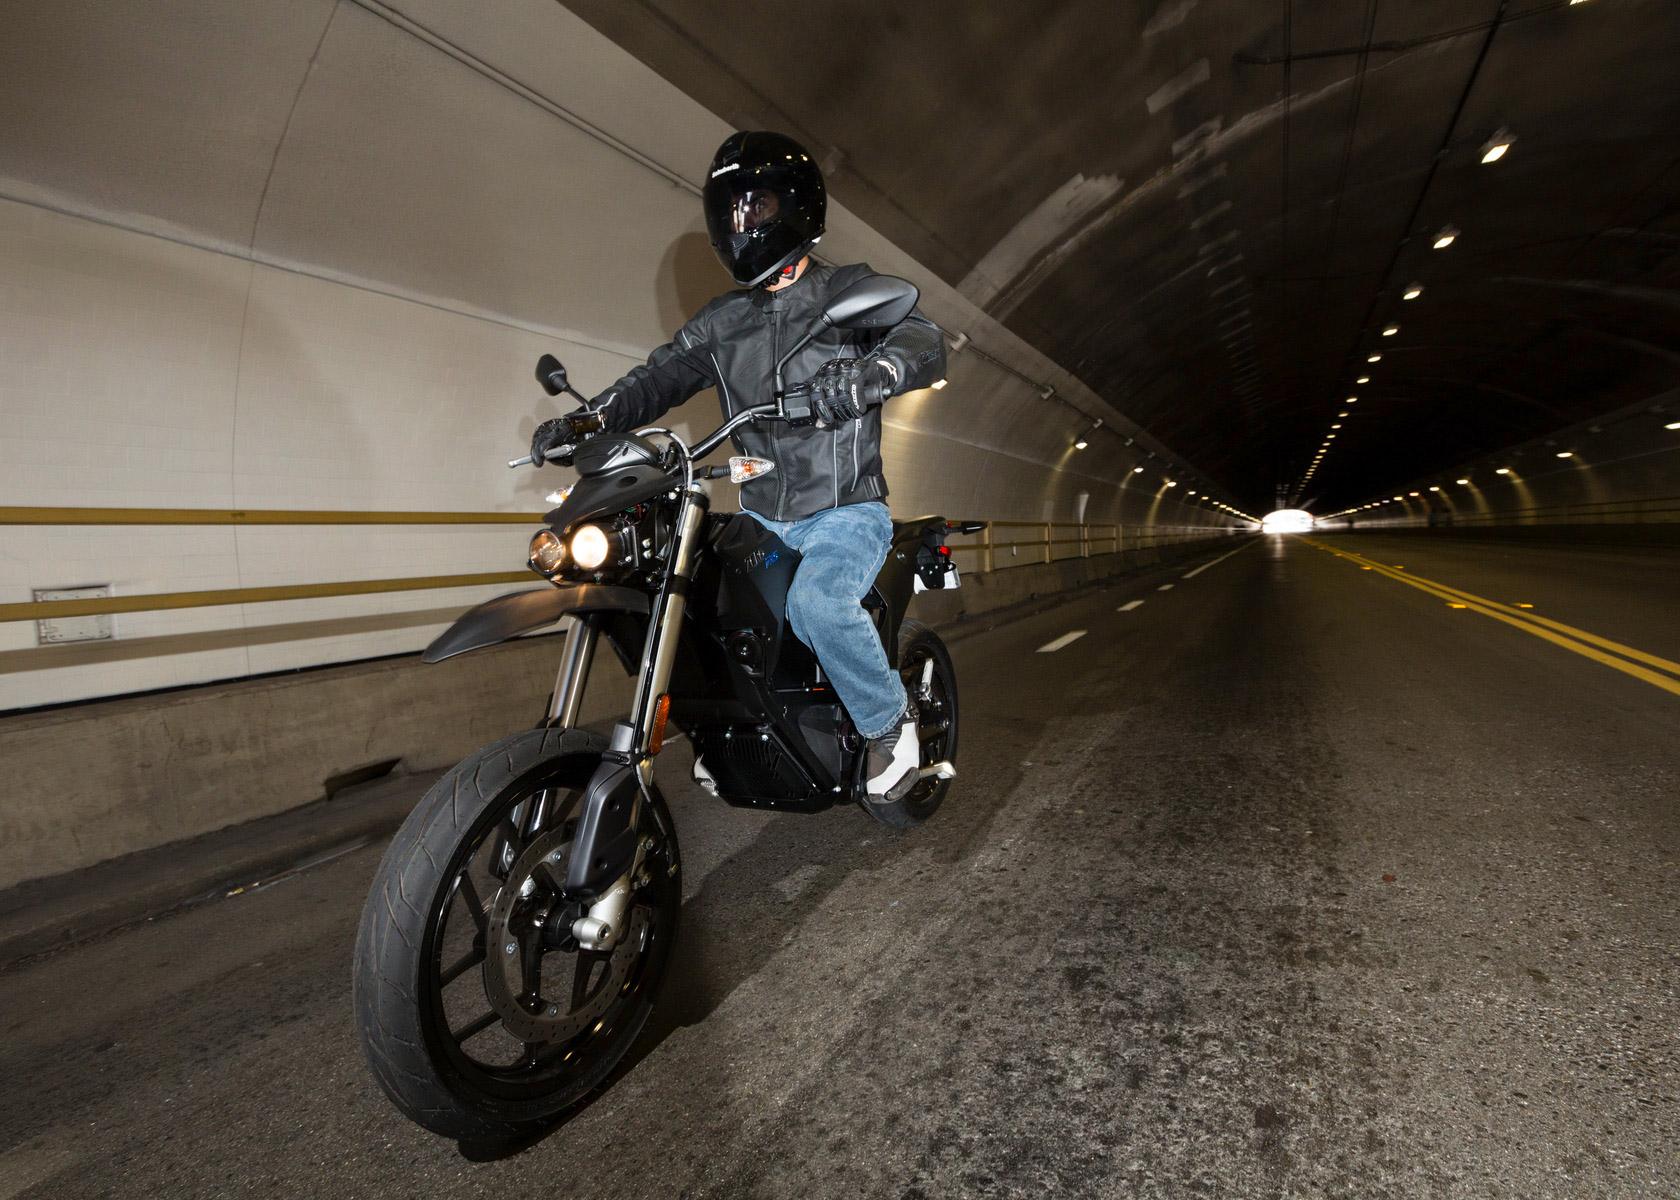 Zero FXS motorbike riding